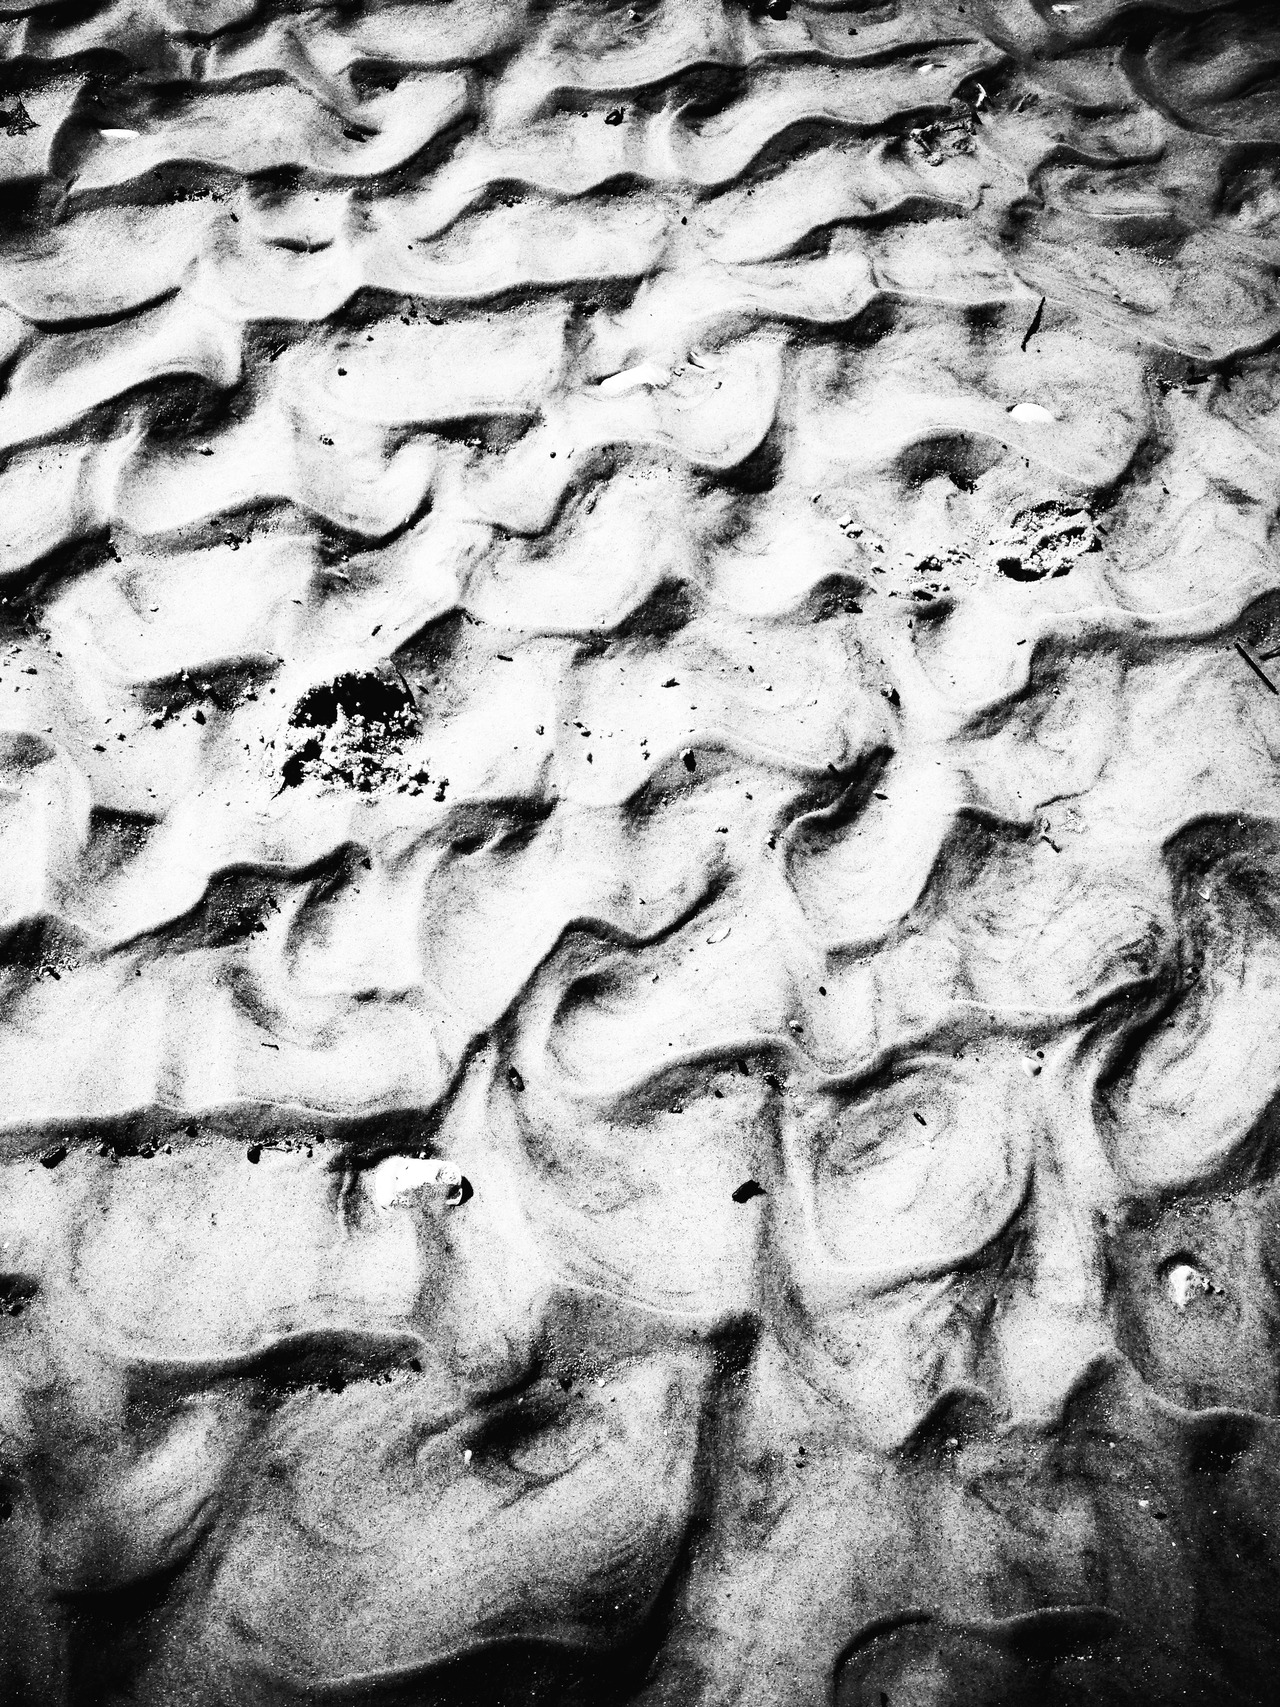 Dunes - #peppersearching #pepper #photos #dunes #sand